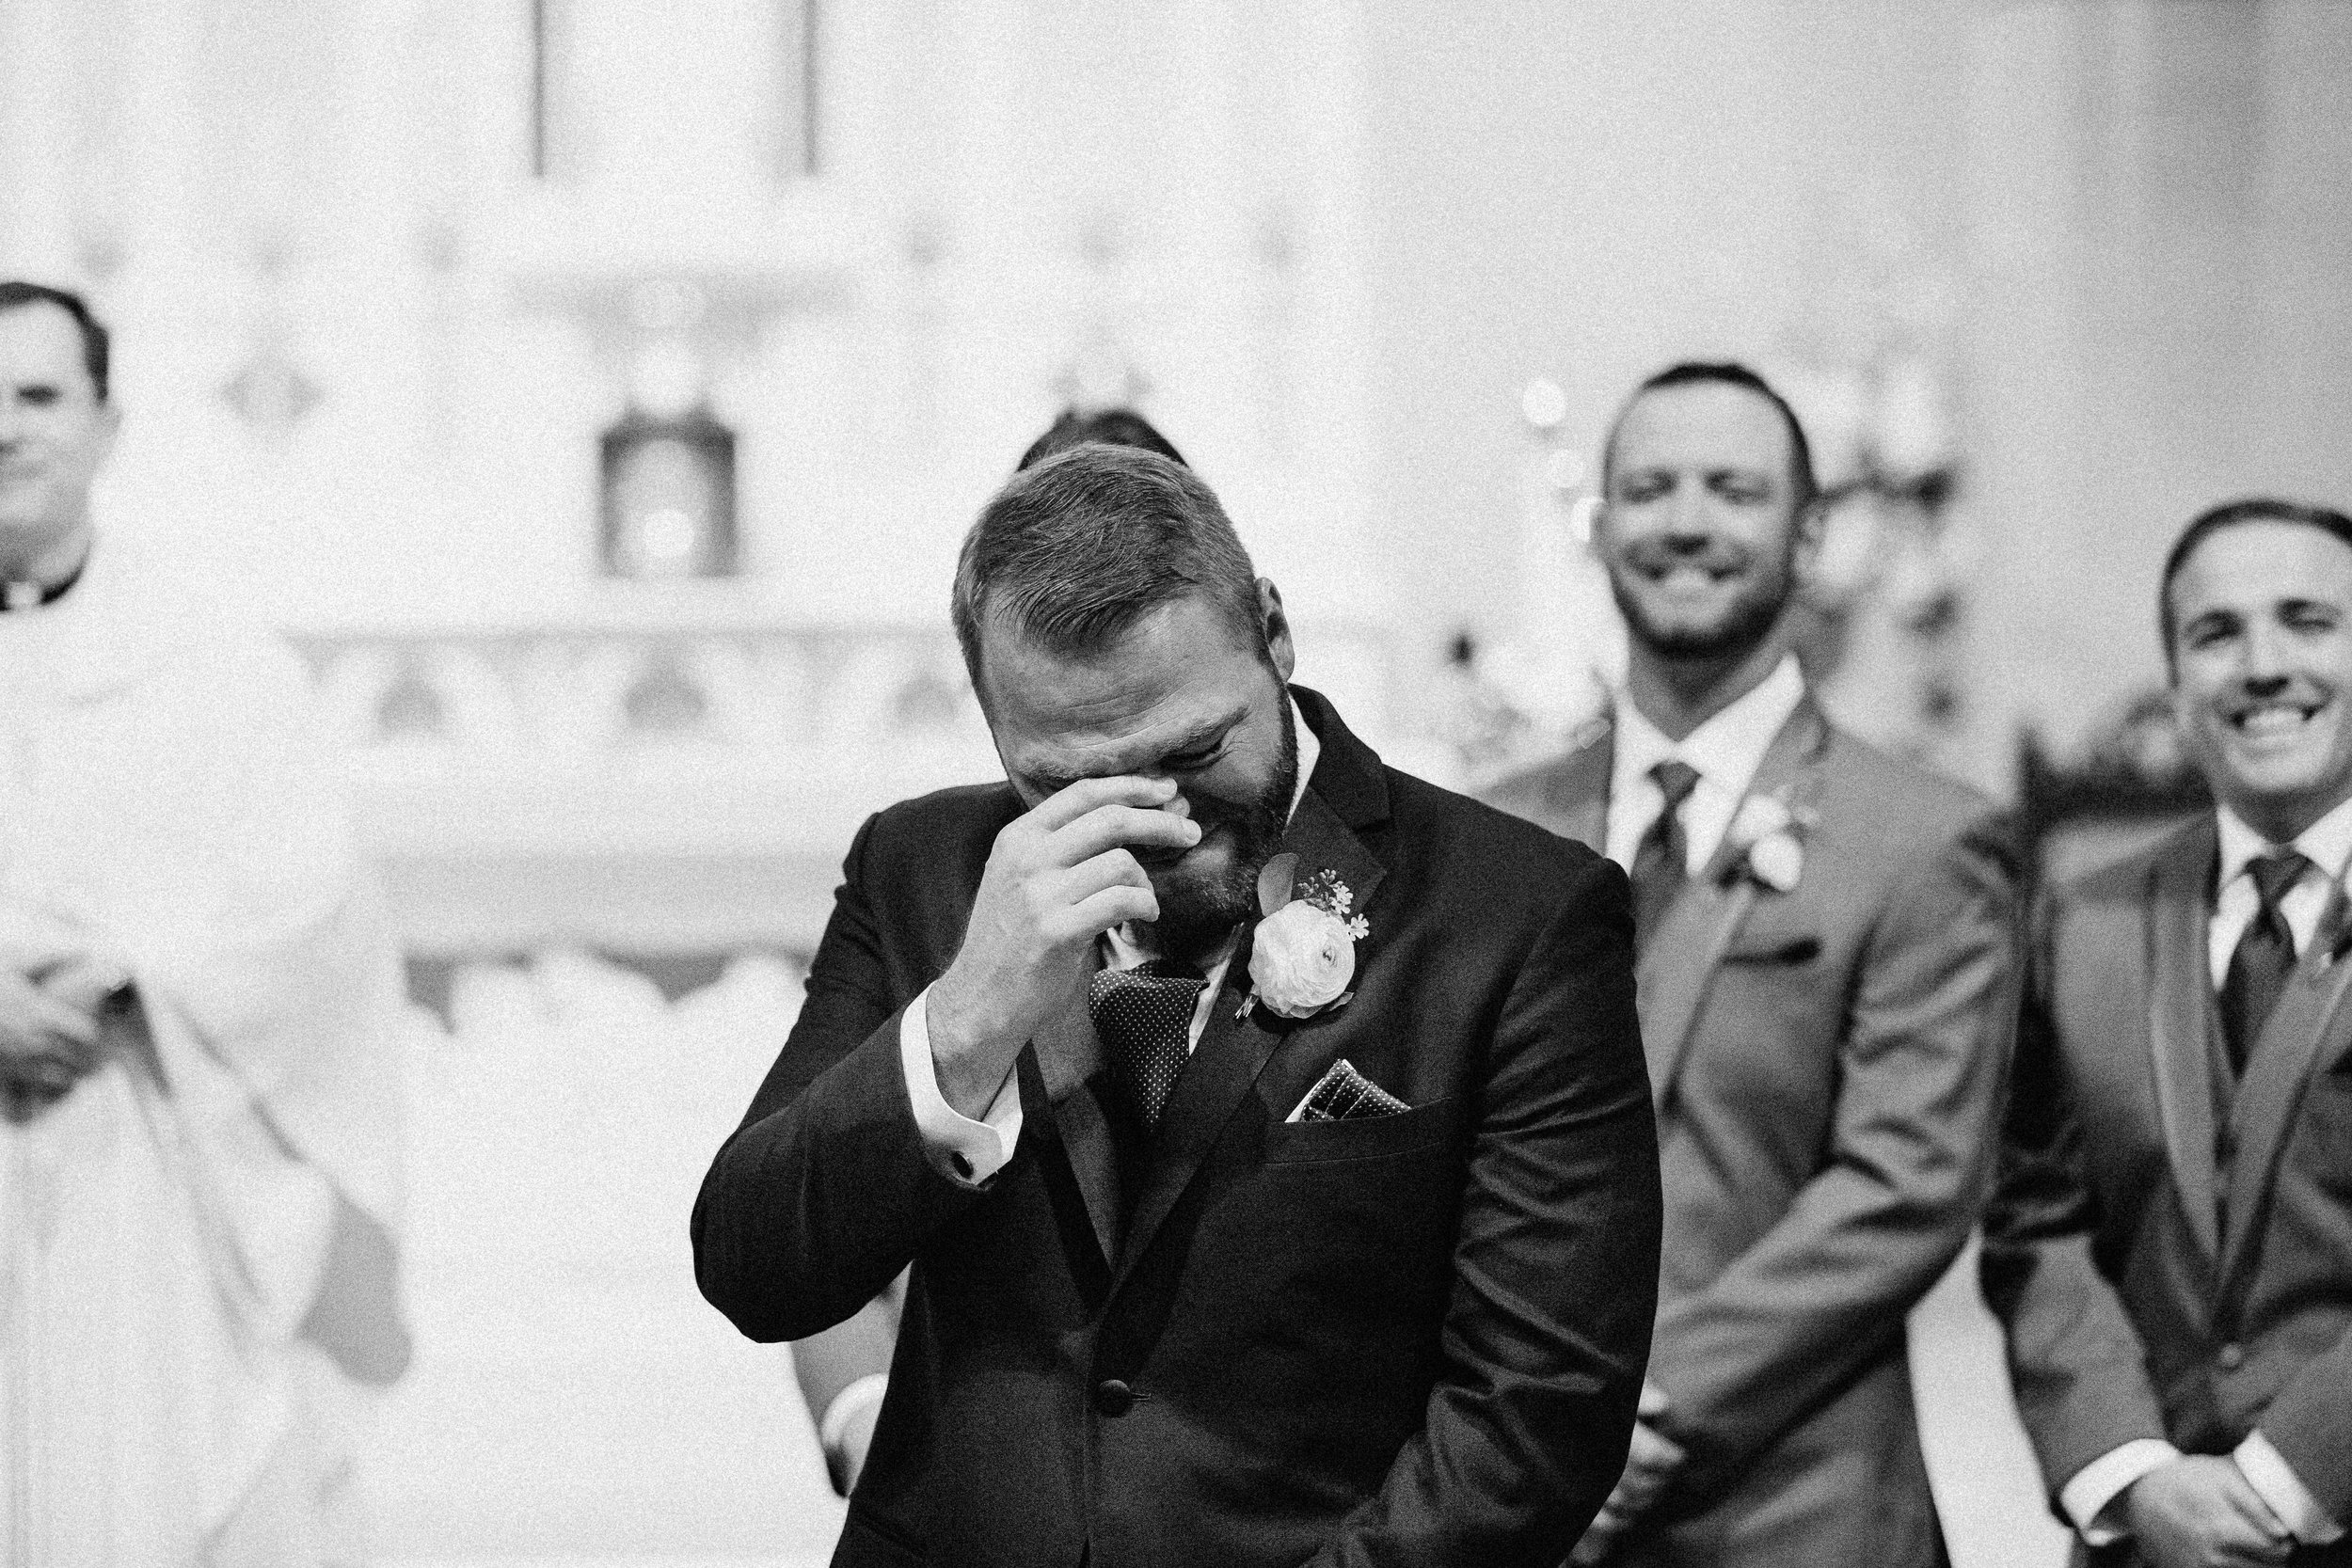 roswell_st_peter_chanel_catholic_avalon_hotel_alpharetta_wedding-1443.jpg